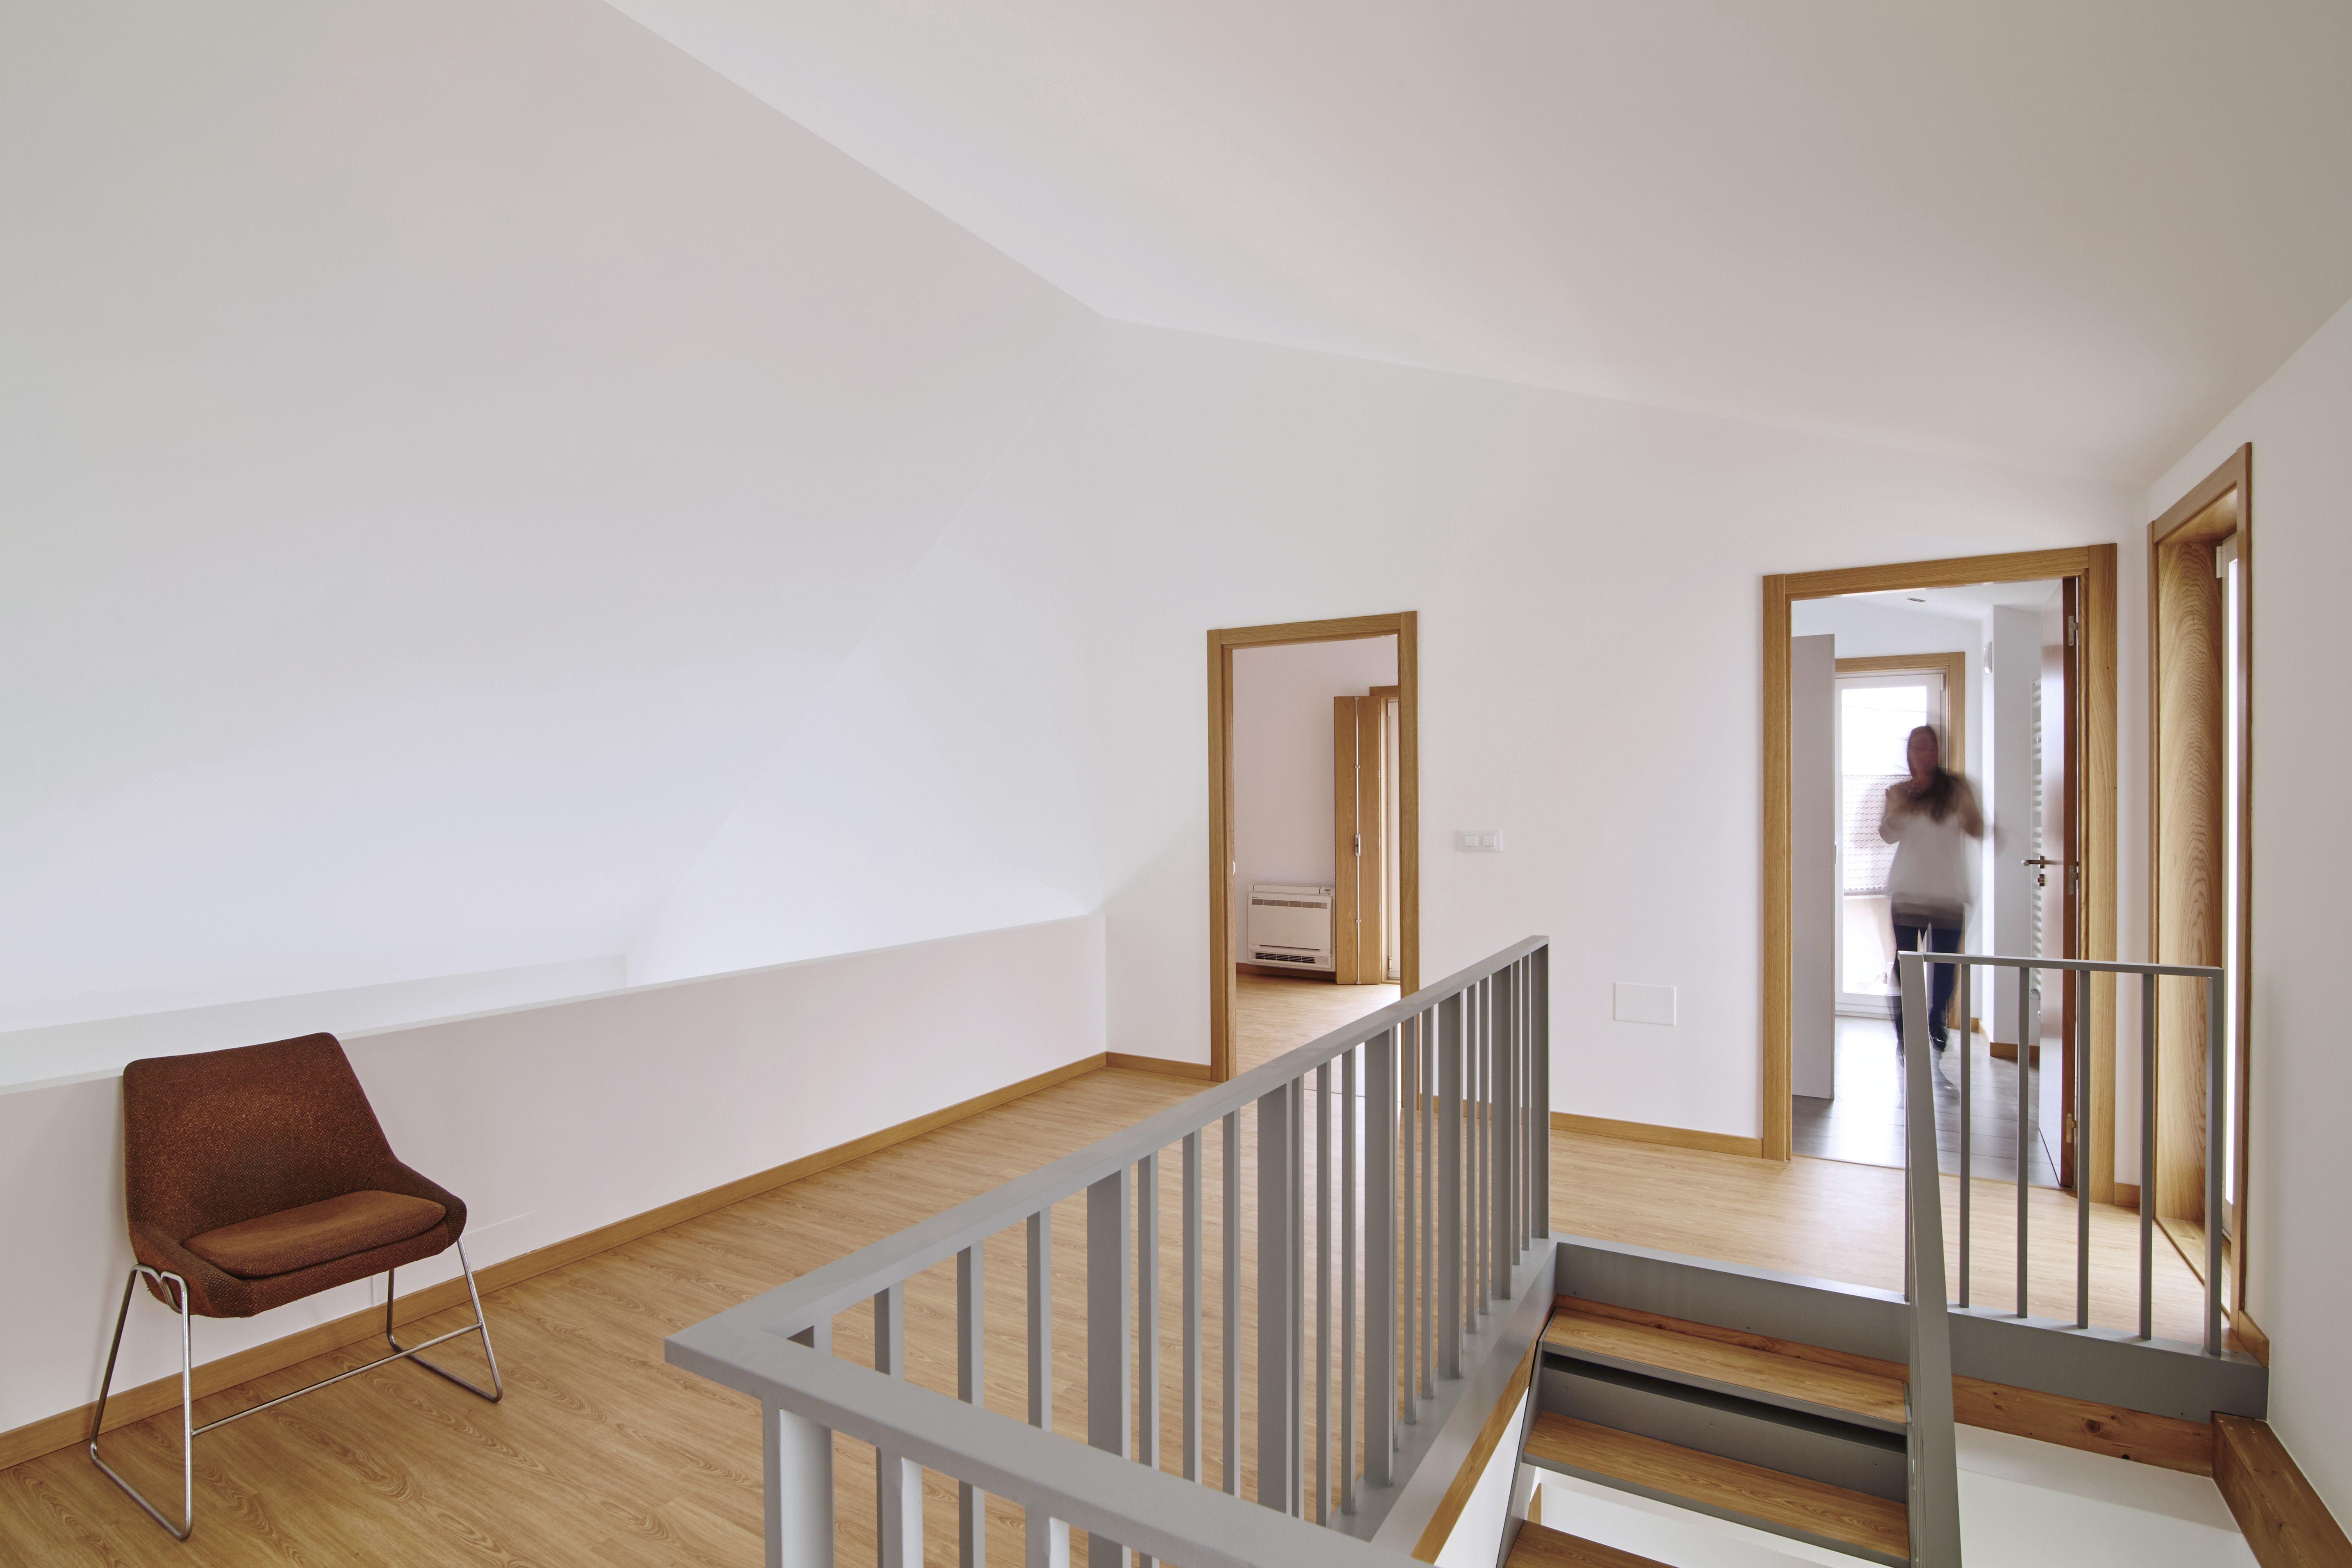 Vivienda unifamiliar en Cela, Bueu. Sra. Farnsworth Estudio de Arquitectura y Diseño. Fotógrafo Pablo Senra.